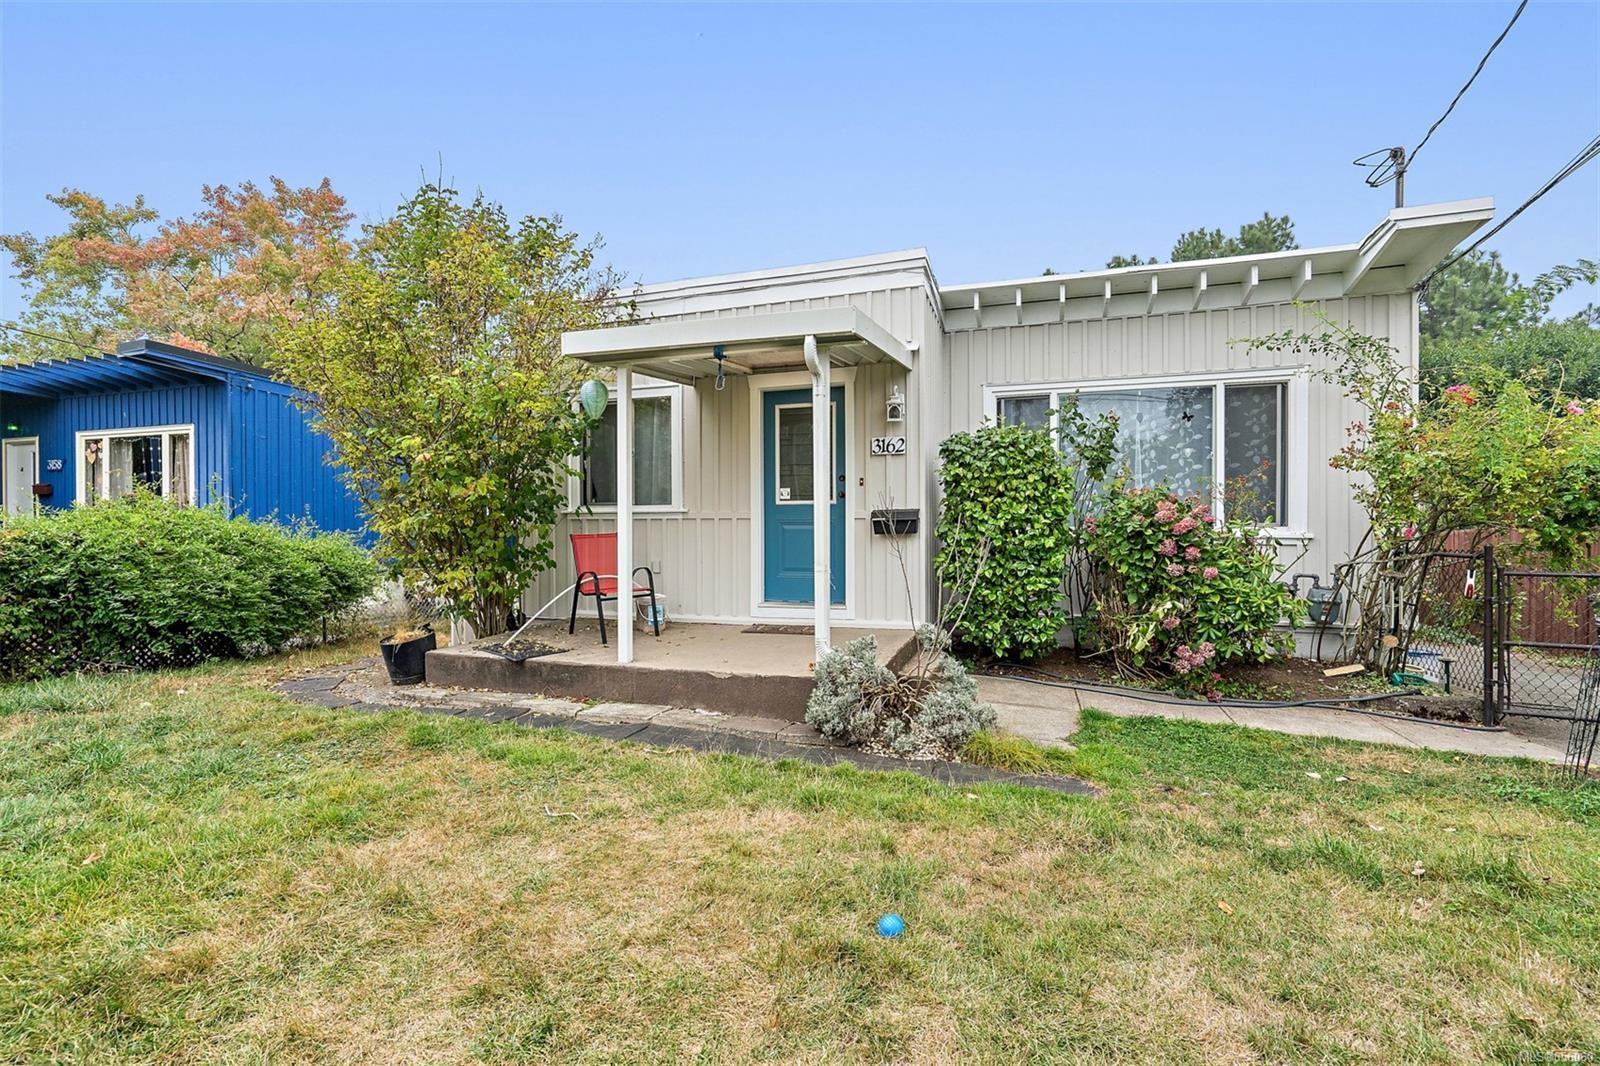 Main Photo: 3162 Alder St in : Vi Mayfair House for sale (Victoria)  : MLS®# 856060